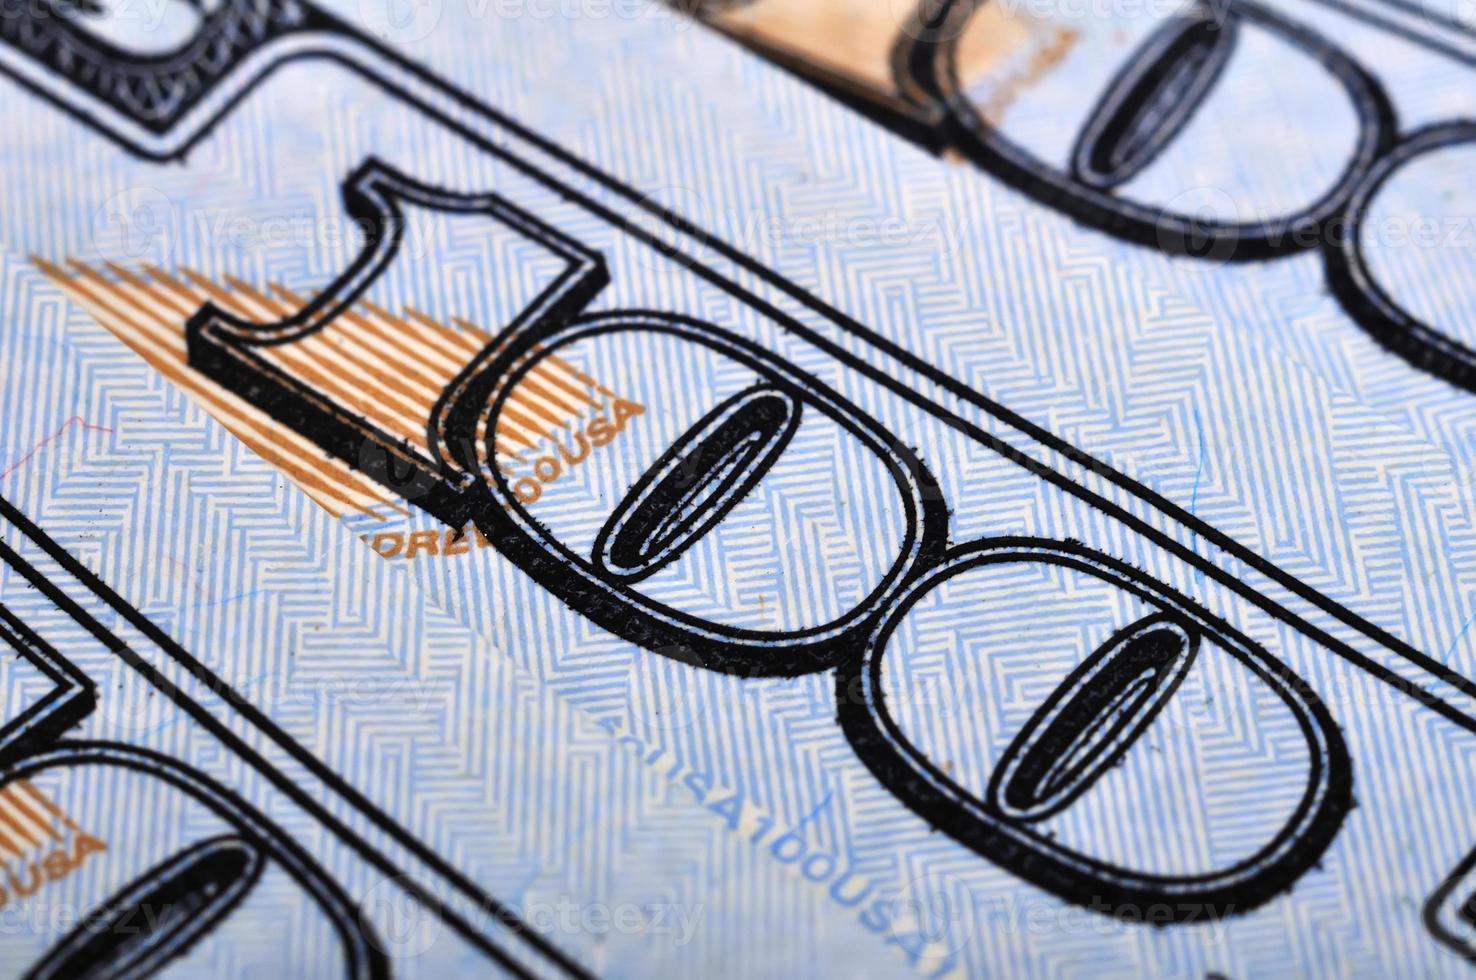 cent billets d'un dollar américain photo